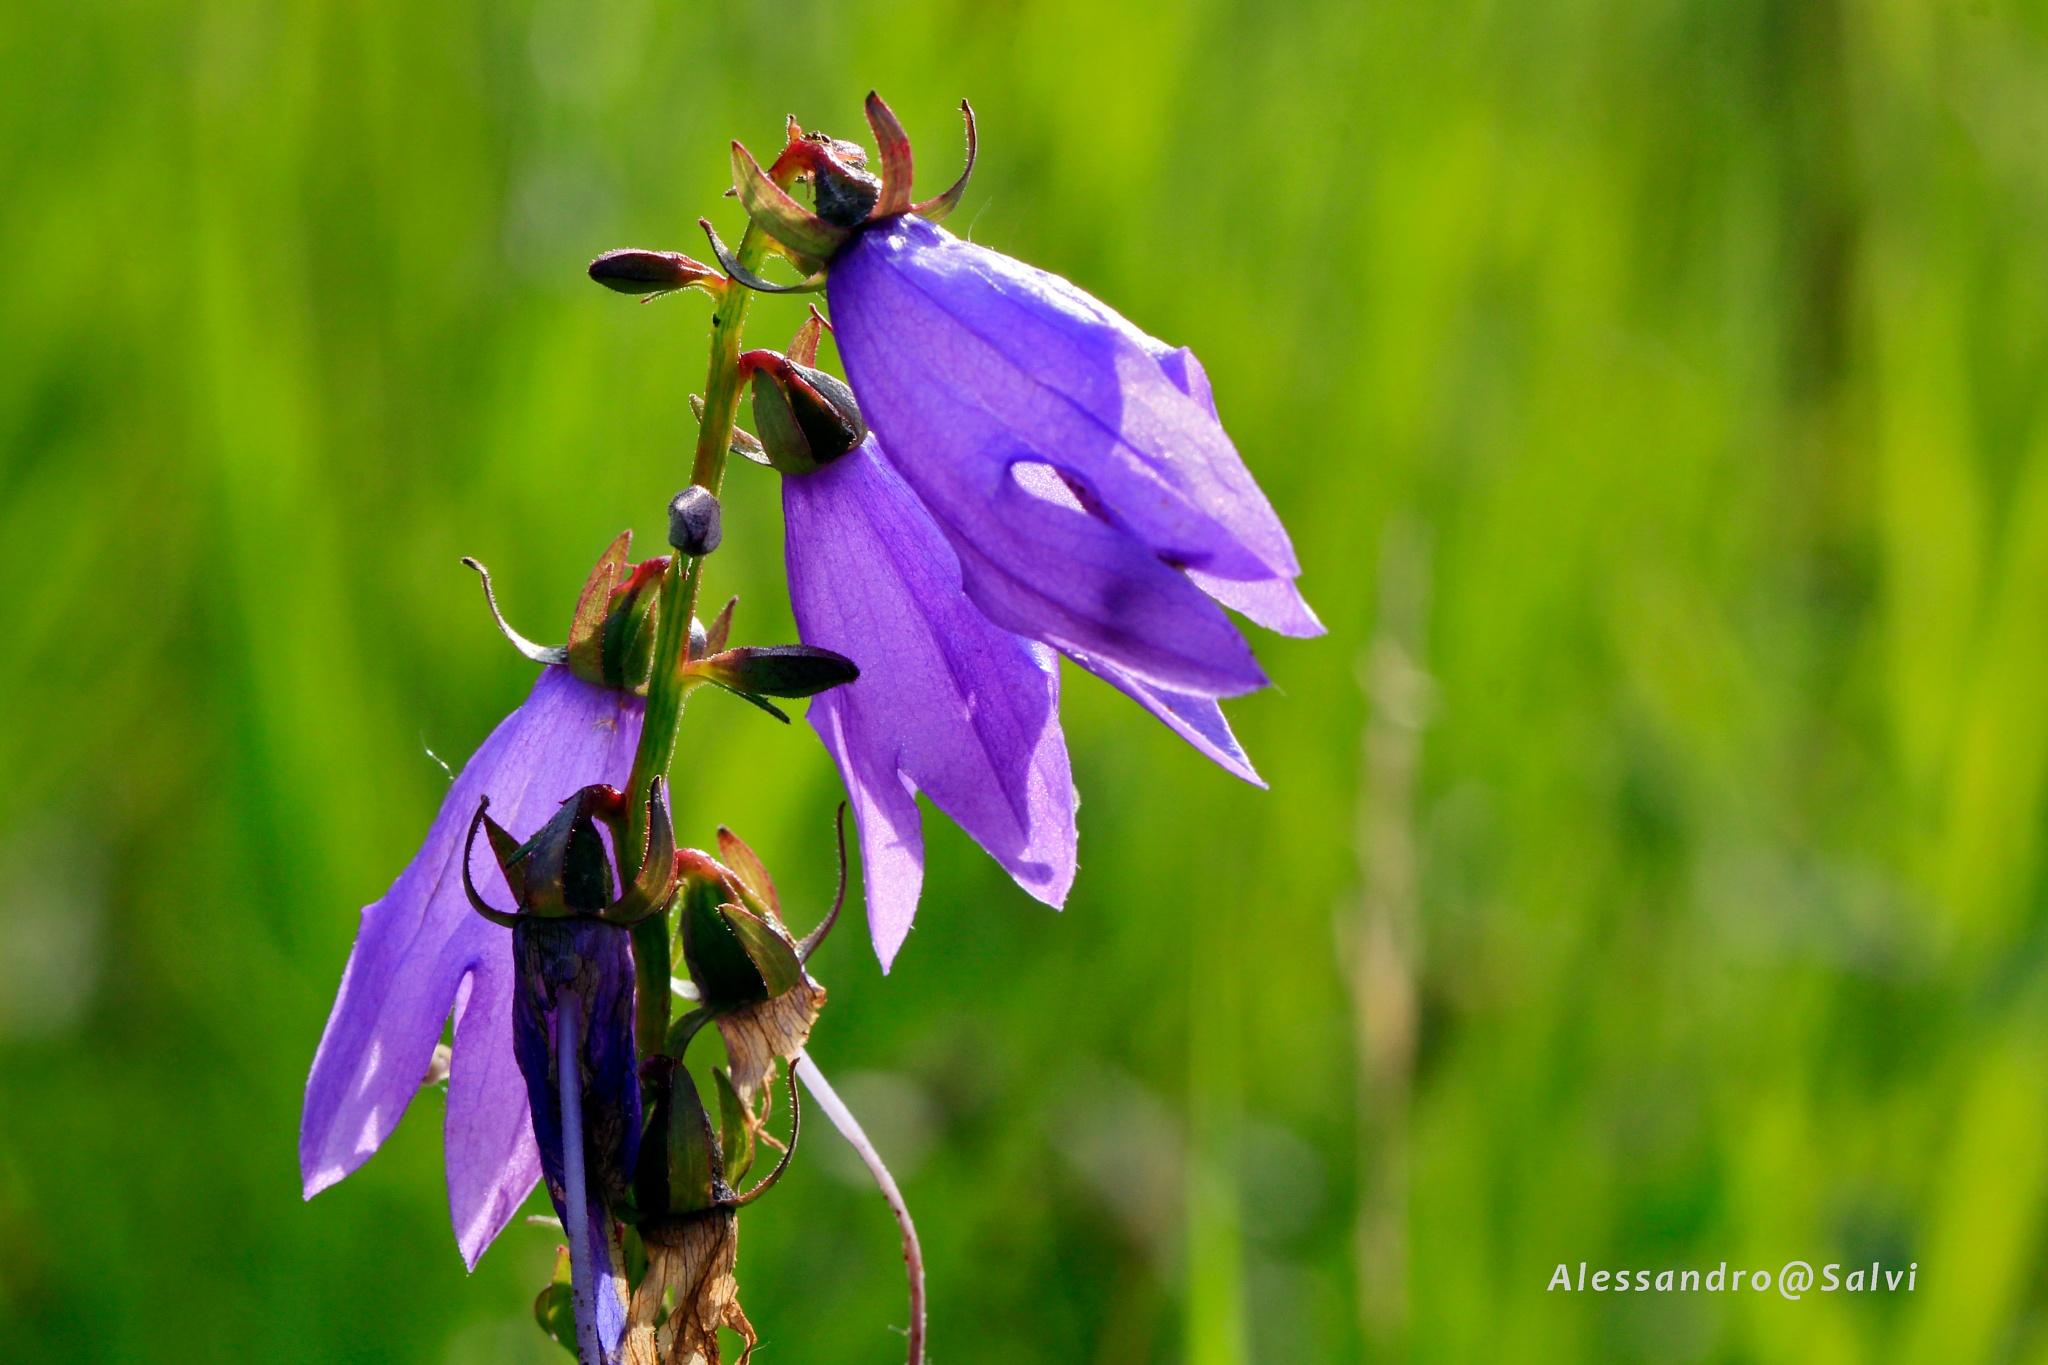 purple flowers by Alessandro Salvi